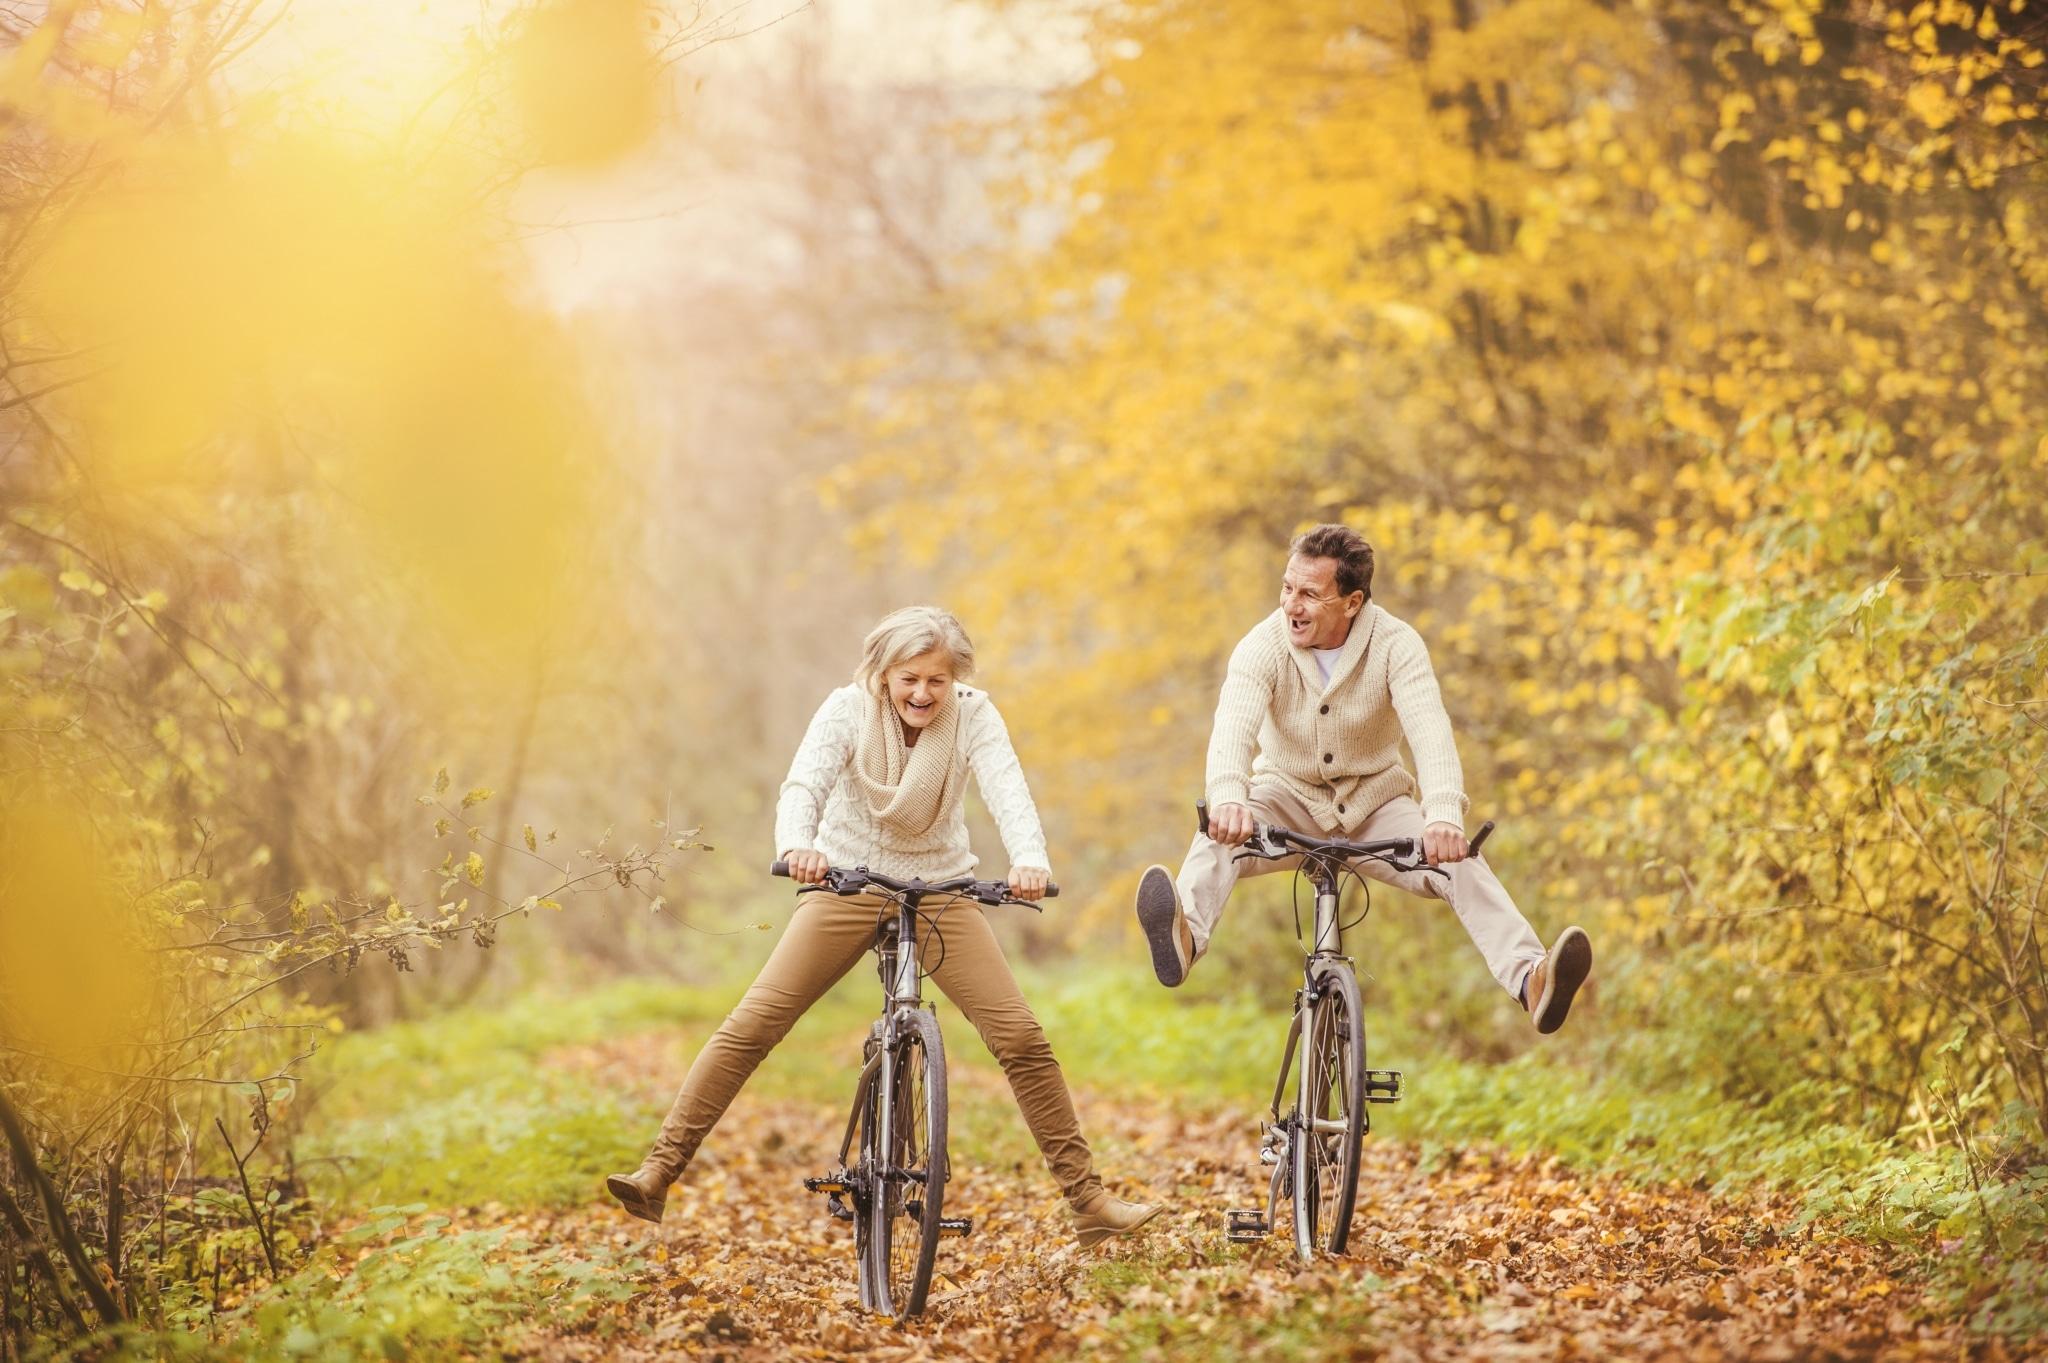 Älteres Paar lachend auf Räderm